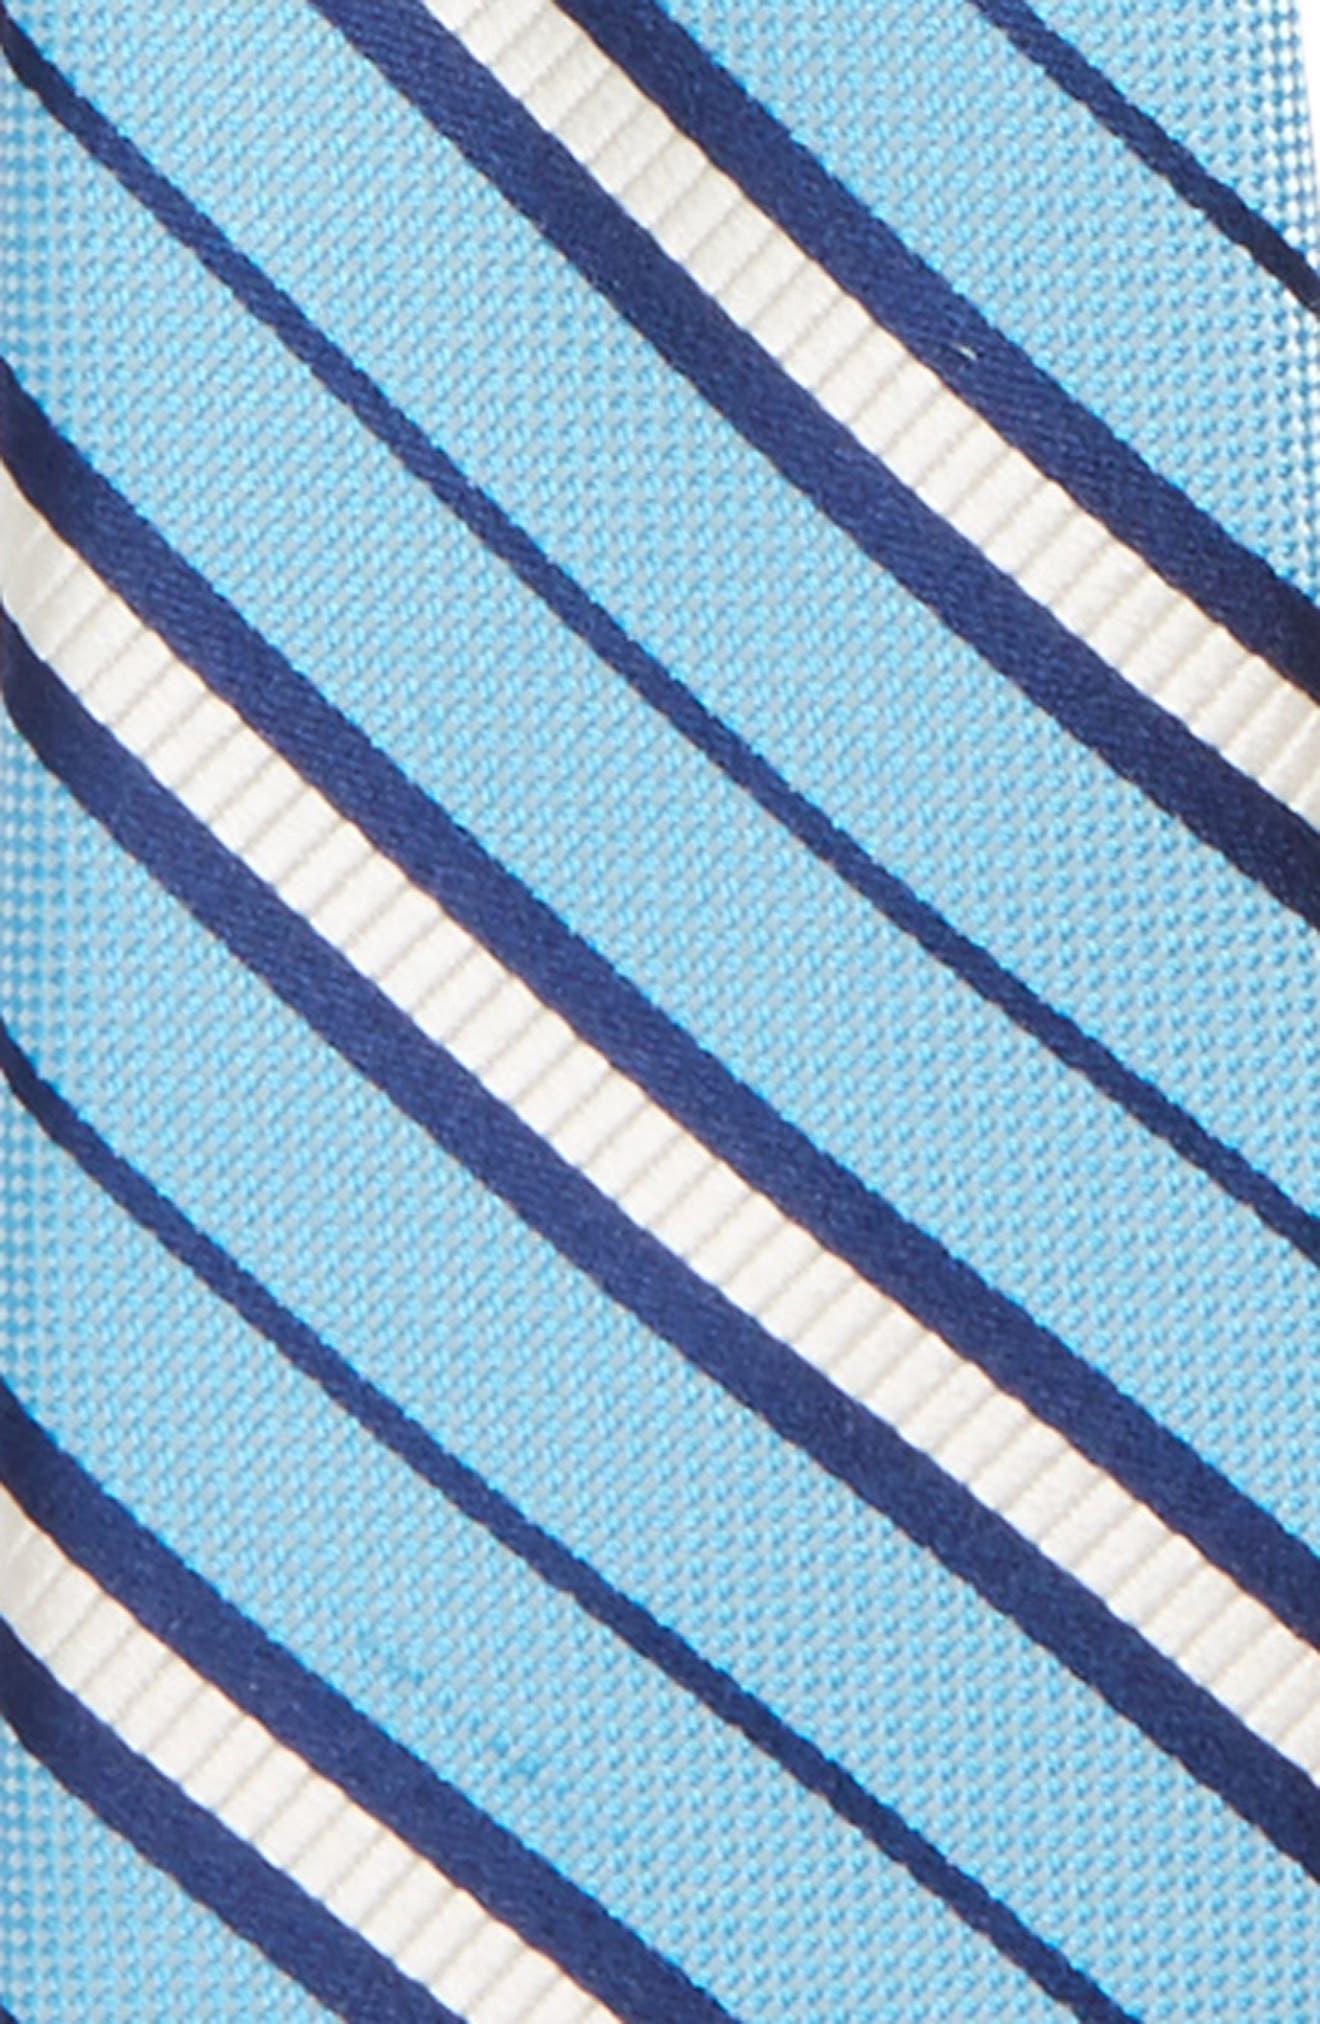 Candy Stripe Silk Zip Tie,                             Alternate thumbnail 2, color,                             Light Blue